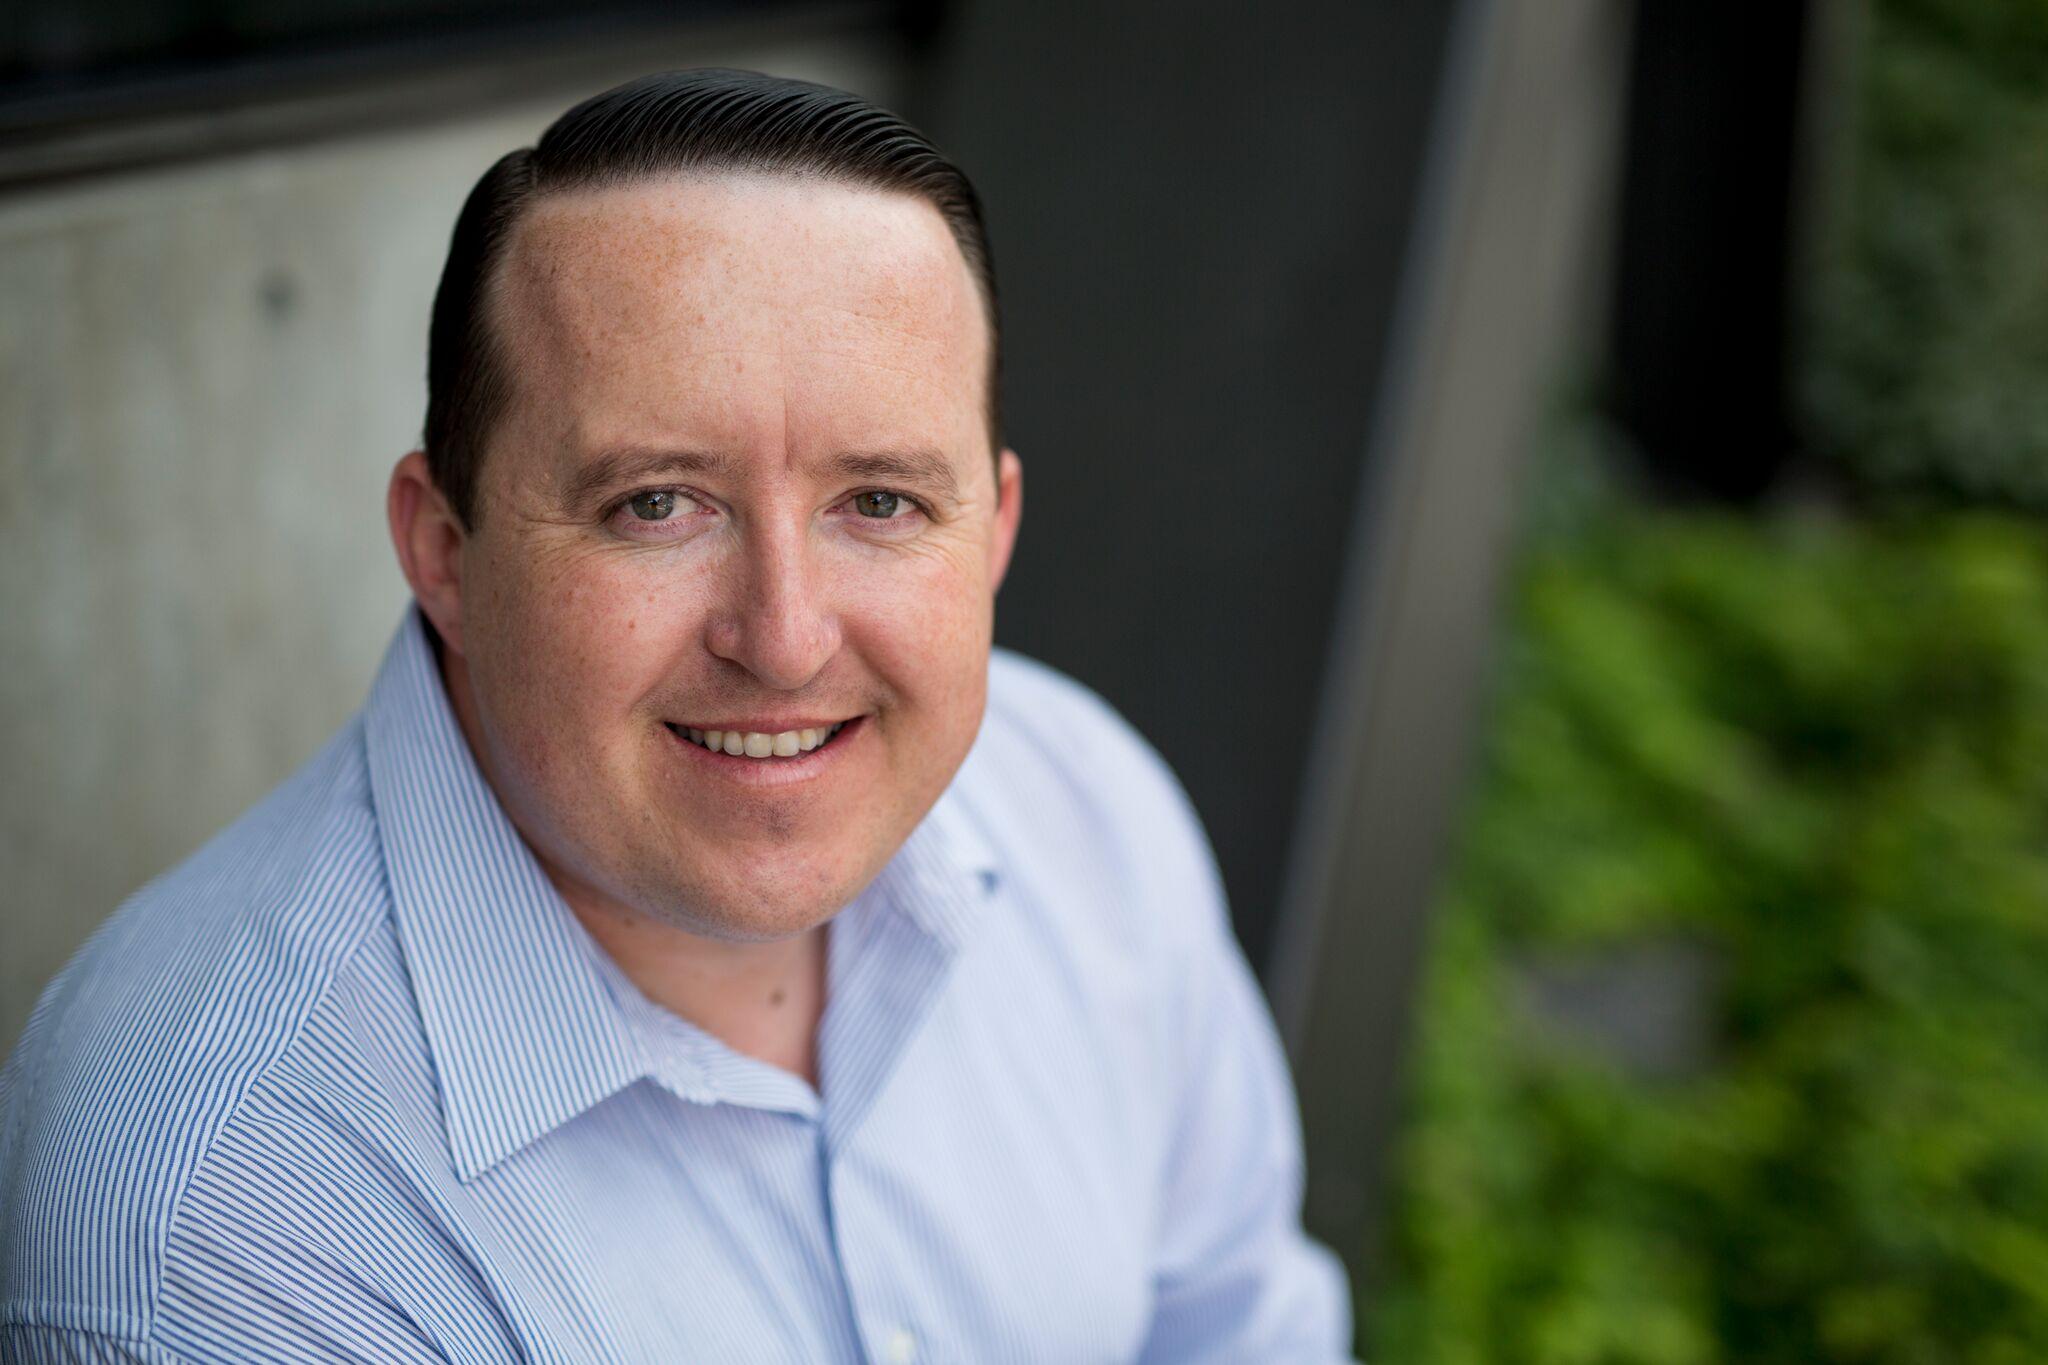 WCG President, Adam M. Wirthlin PE